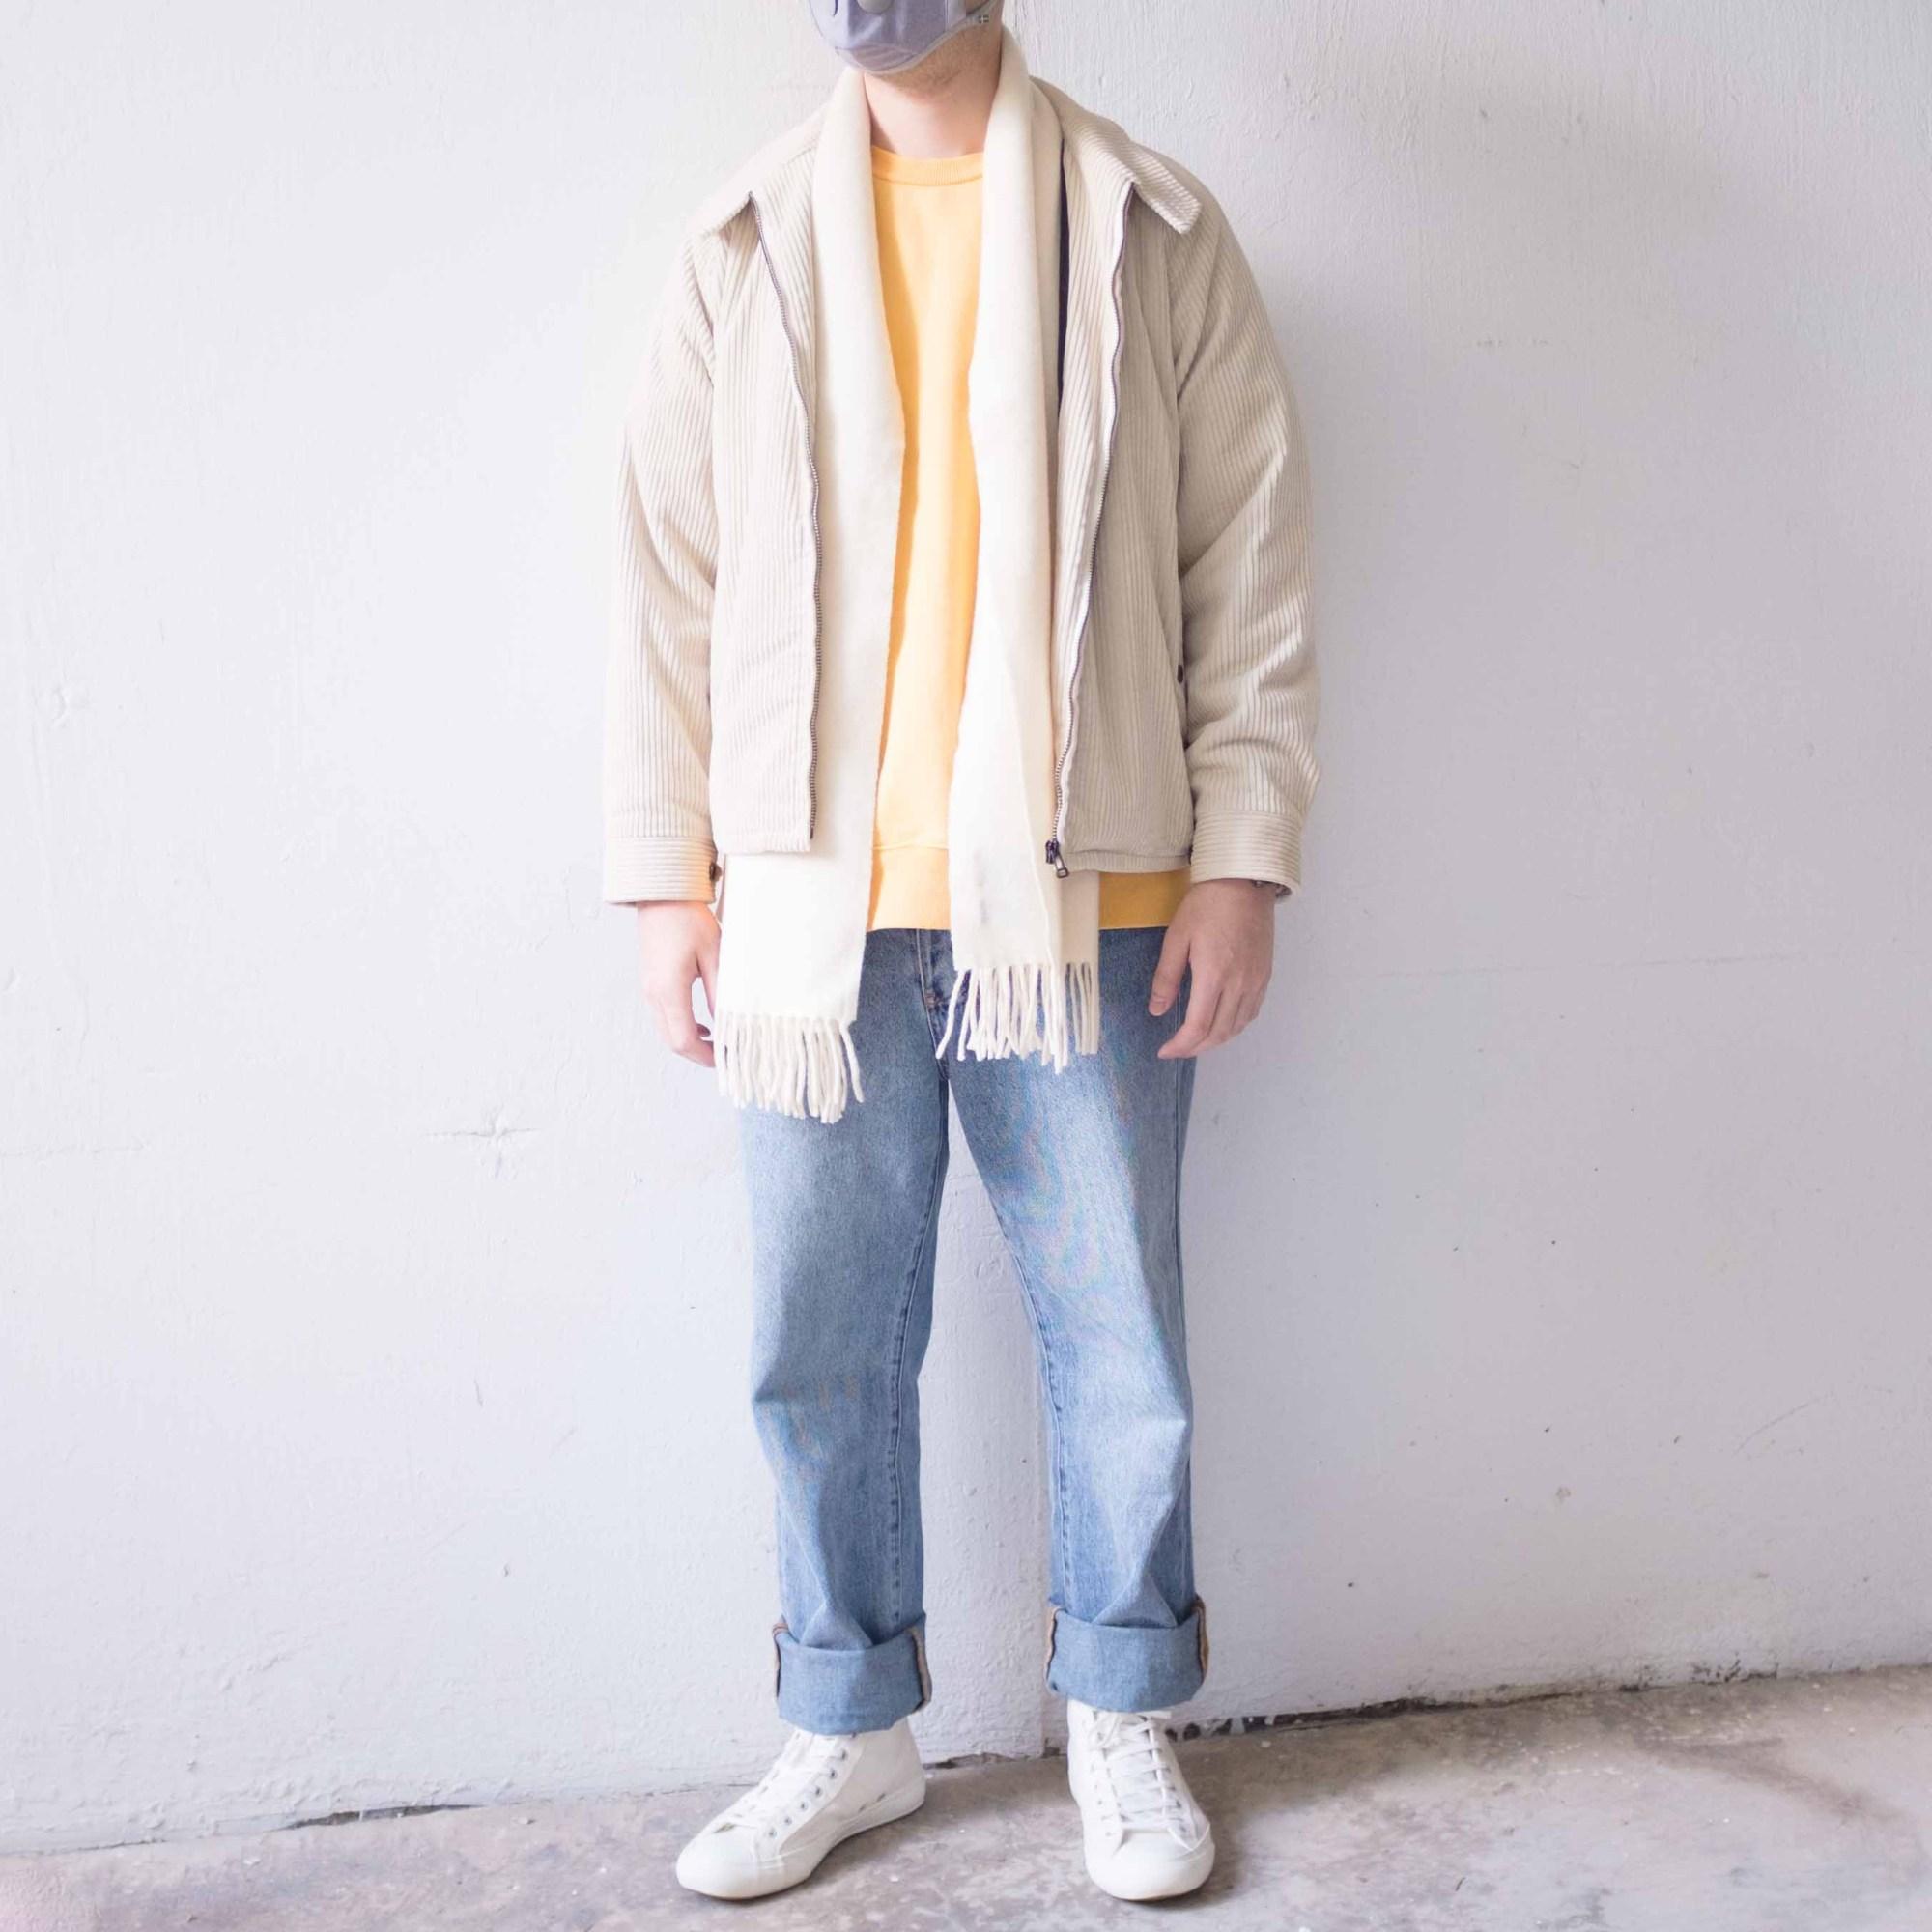 Ksubi Awaken sweat x anti k jeans x Kuro g9 jacket